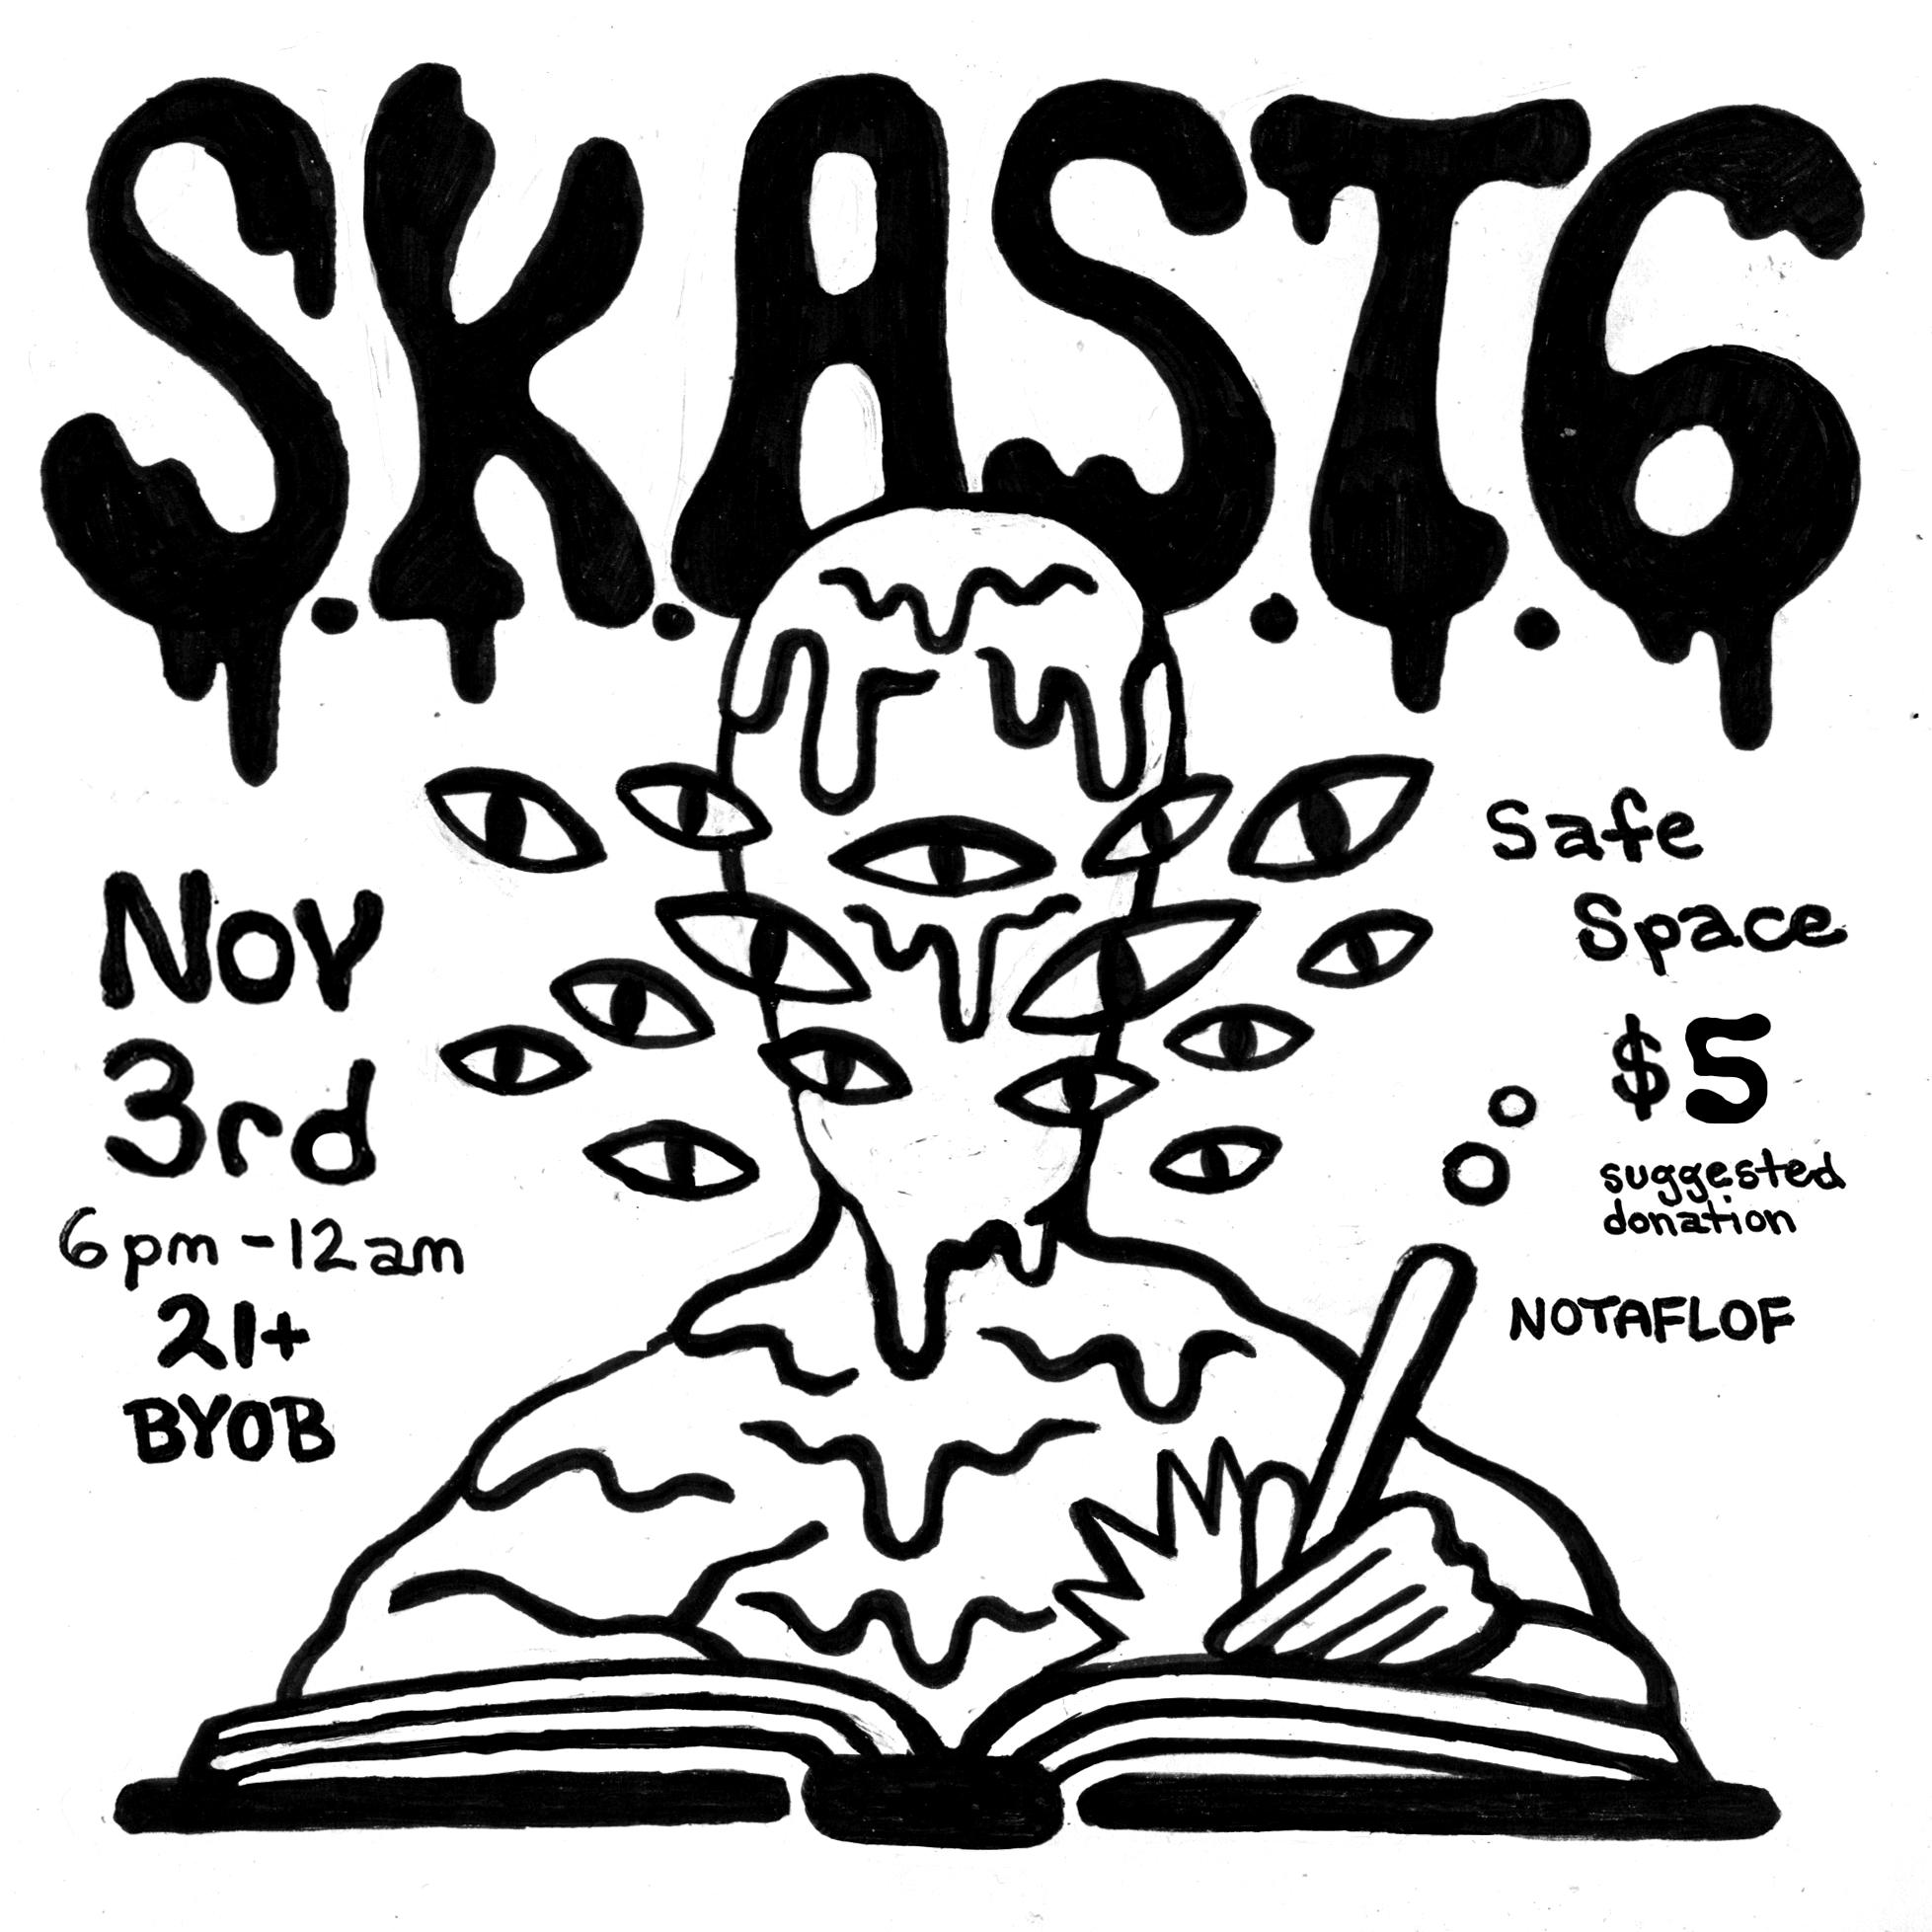 Flyer Design for S.K.A.S.T. 6  2018